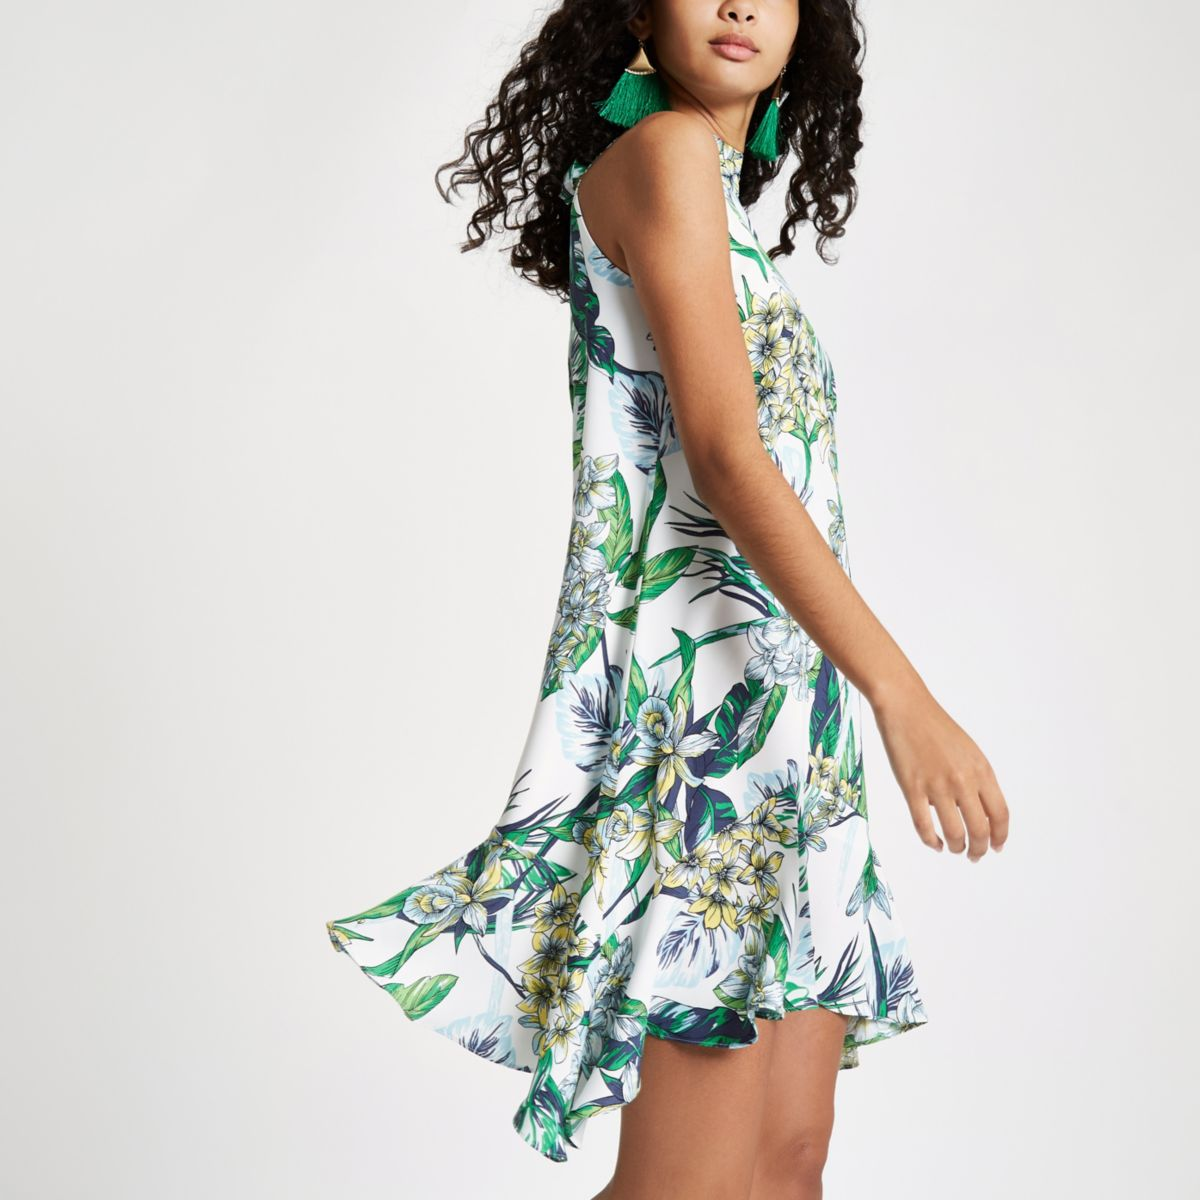 White Floral Print Swing Dress Dresses Sale Women